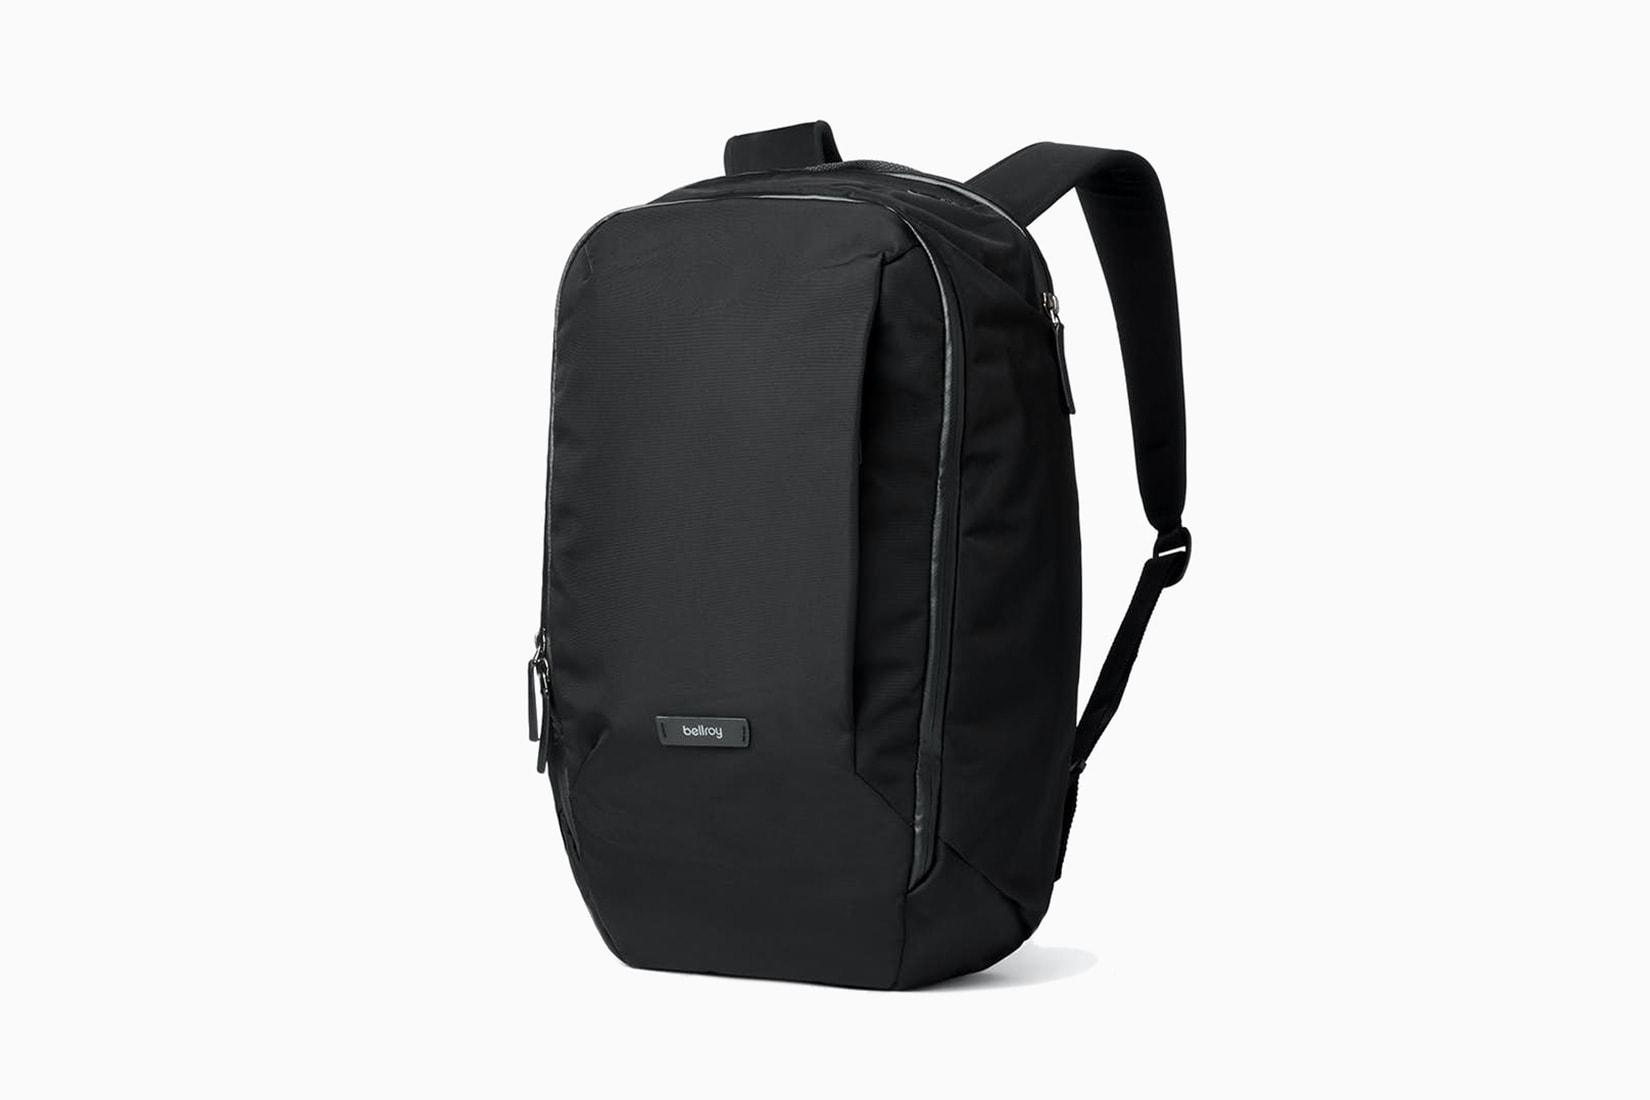 best men gym bag bellroy transit review - Luxe Digital